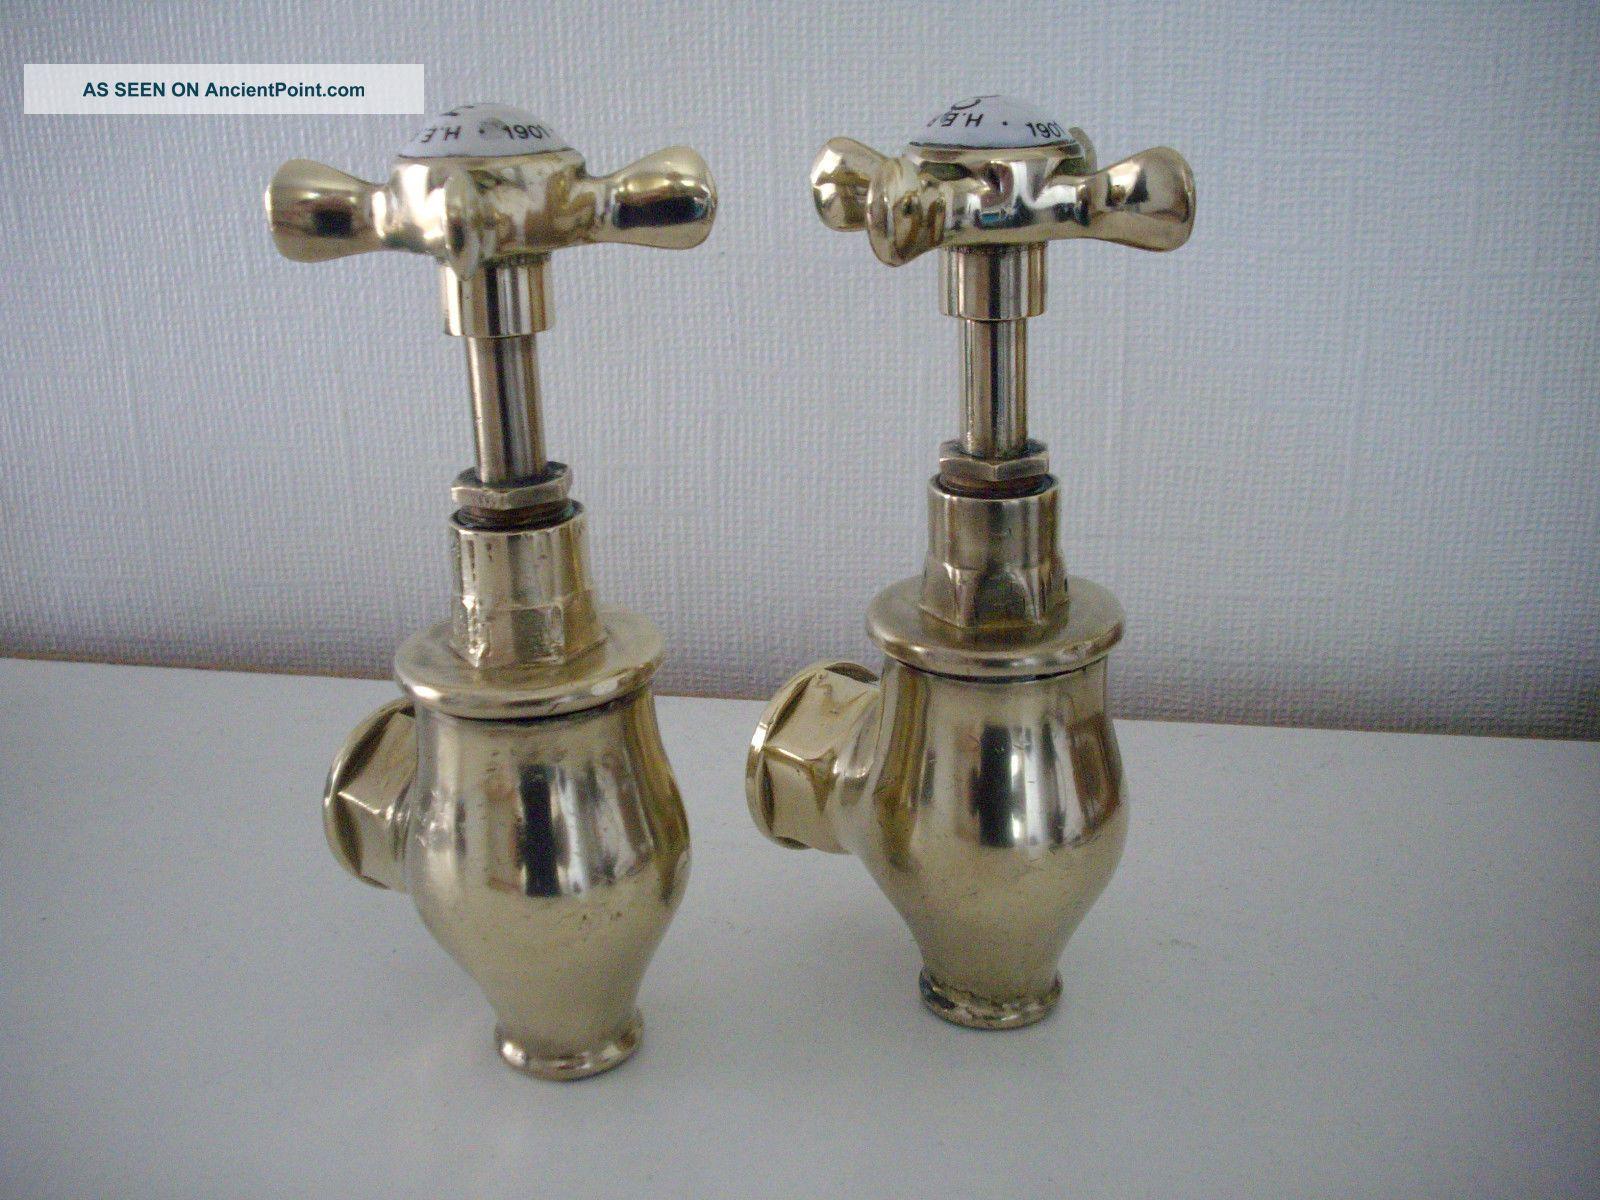 Pr - Reclaimed Vintage Solid Brass Globe Bath Taps